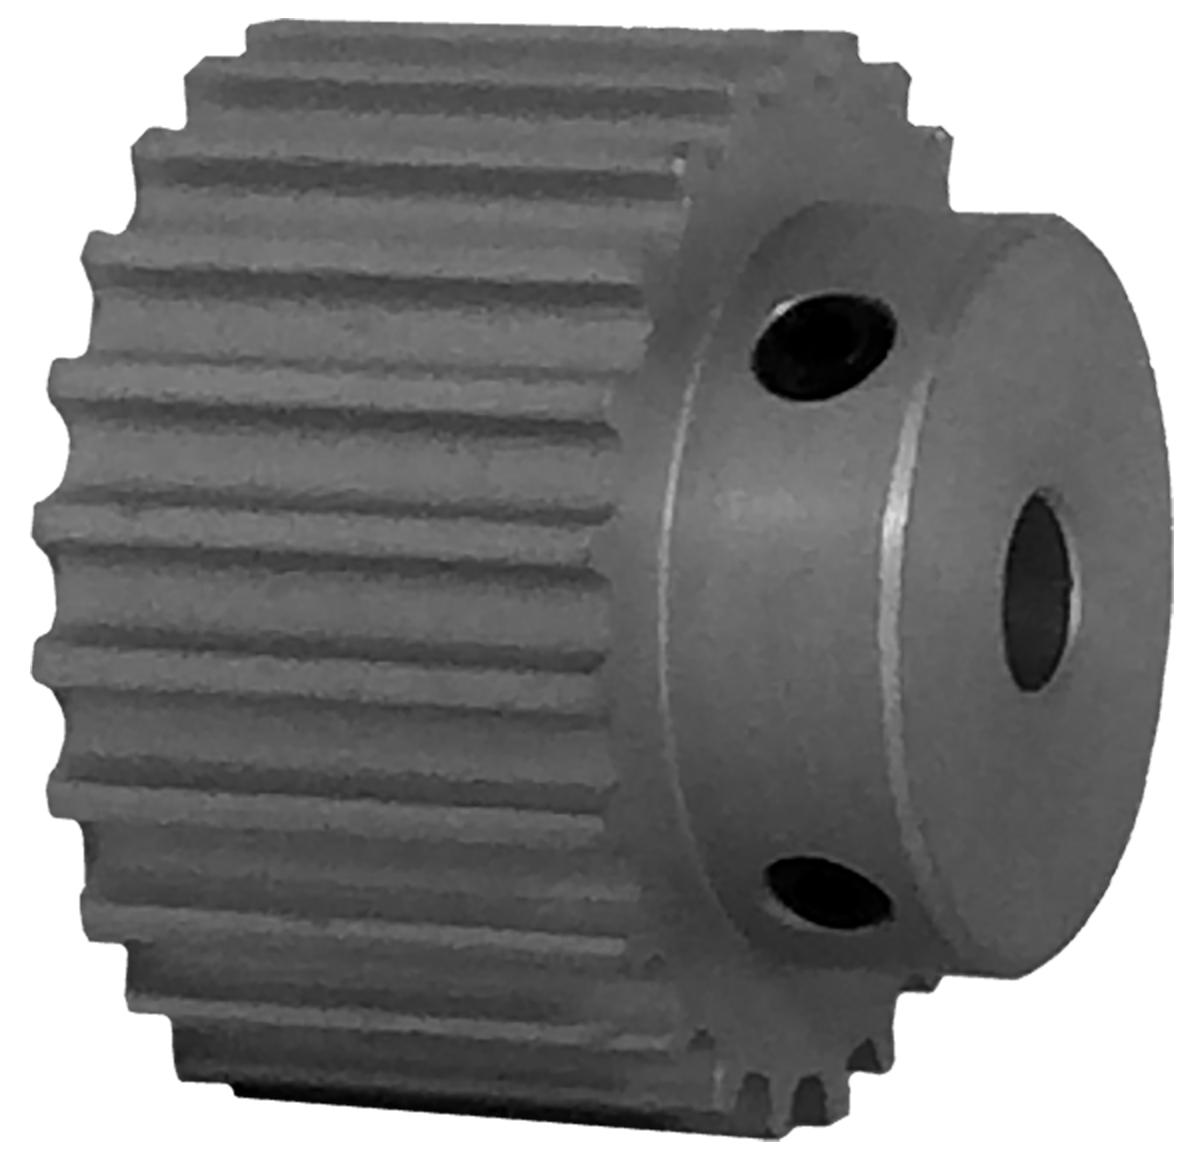 24-5M15-6A3 - Aluminum Powerhouse®HTD® Pulleys